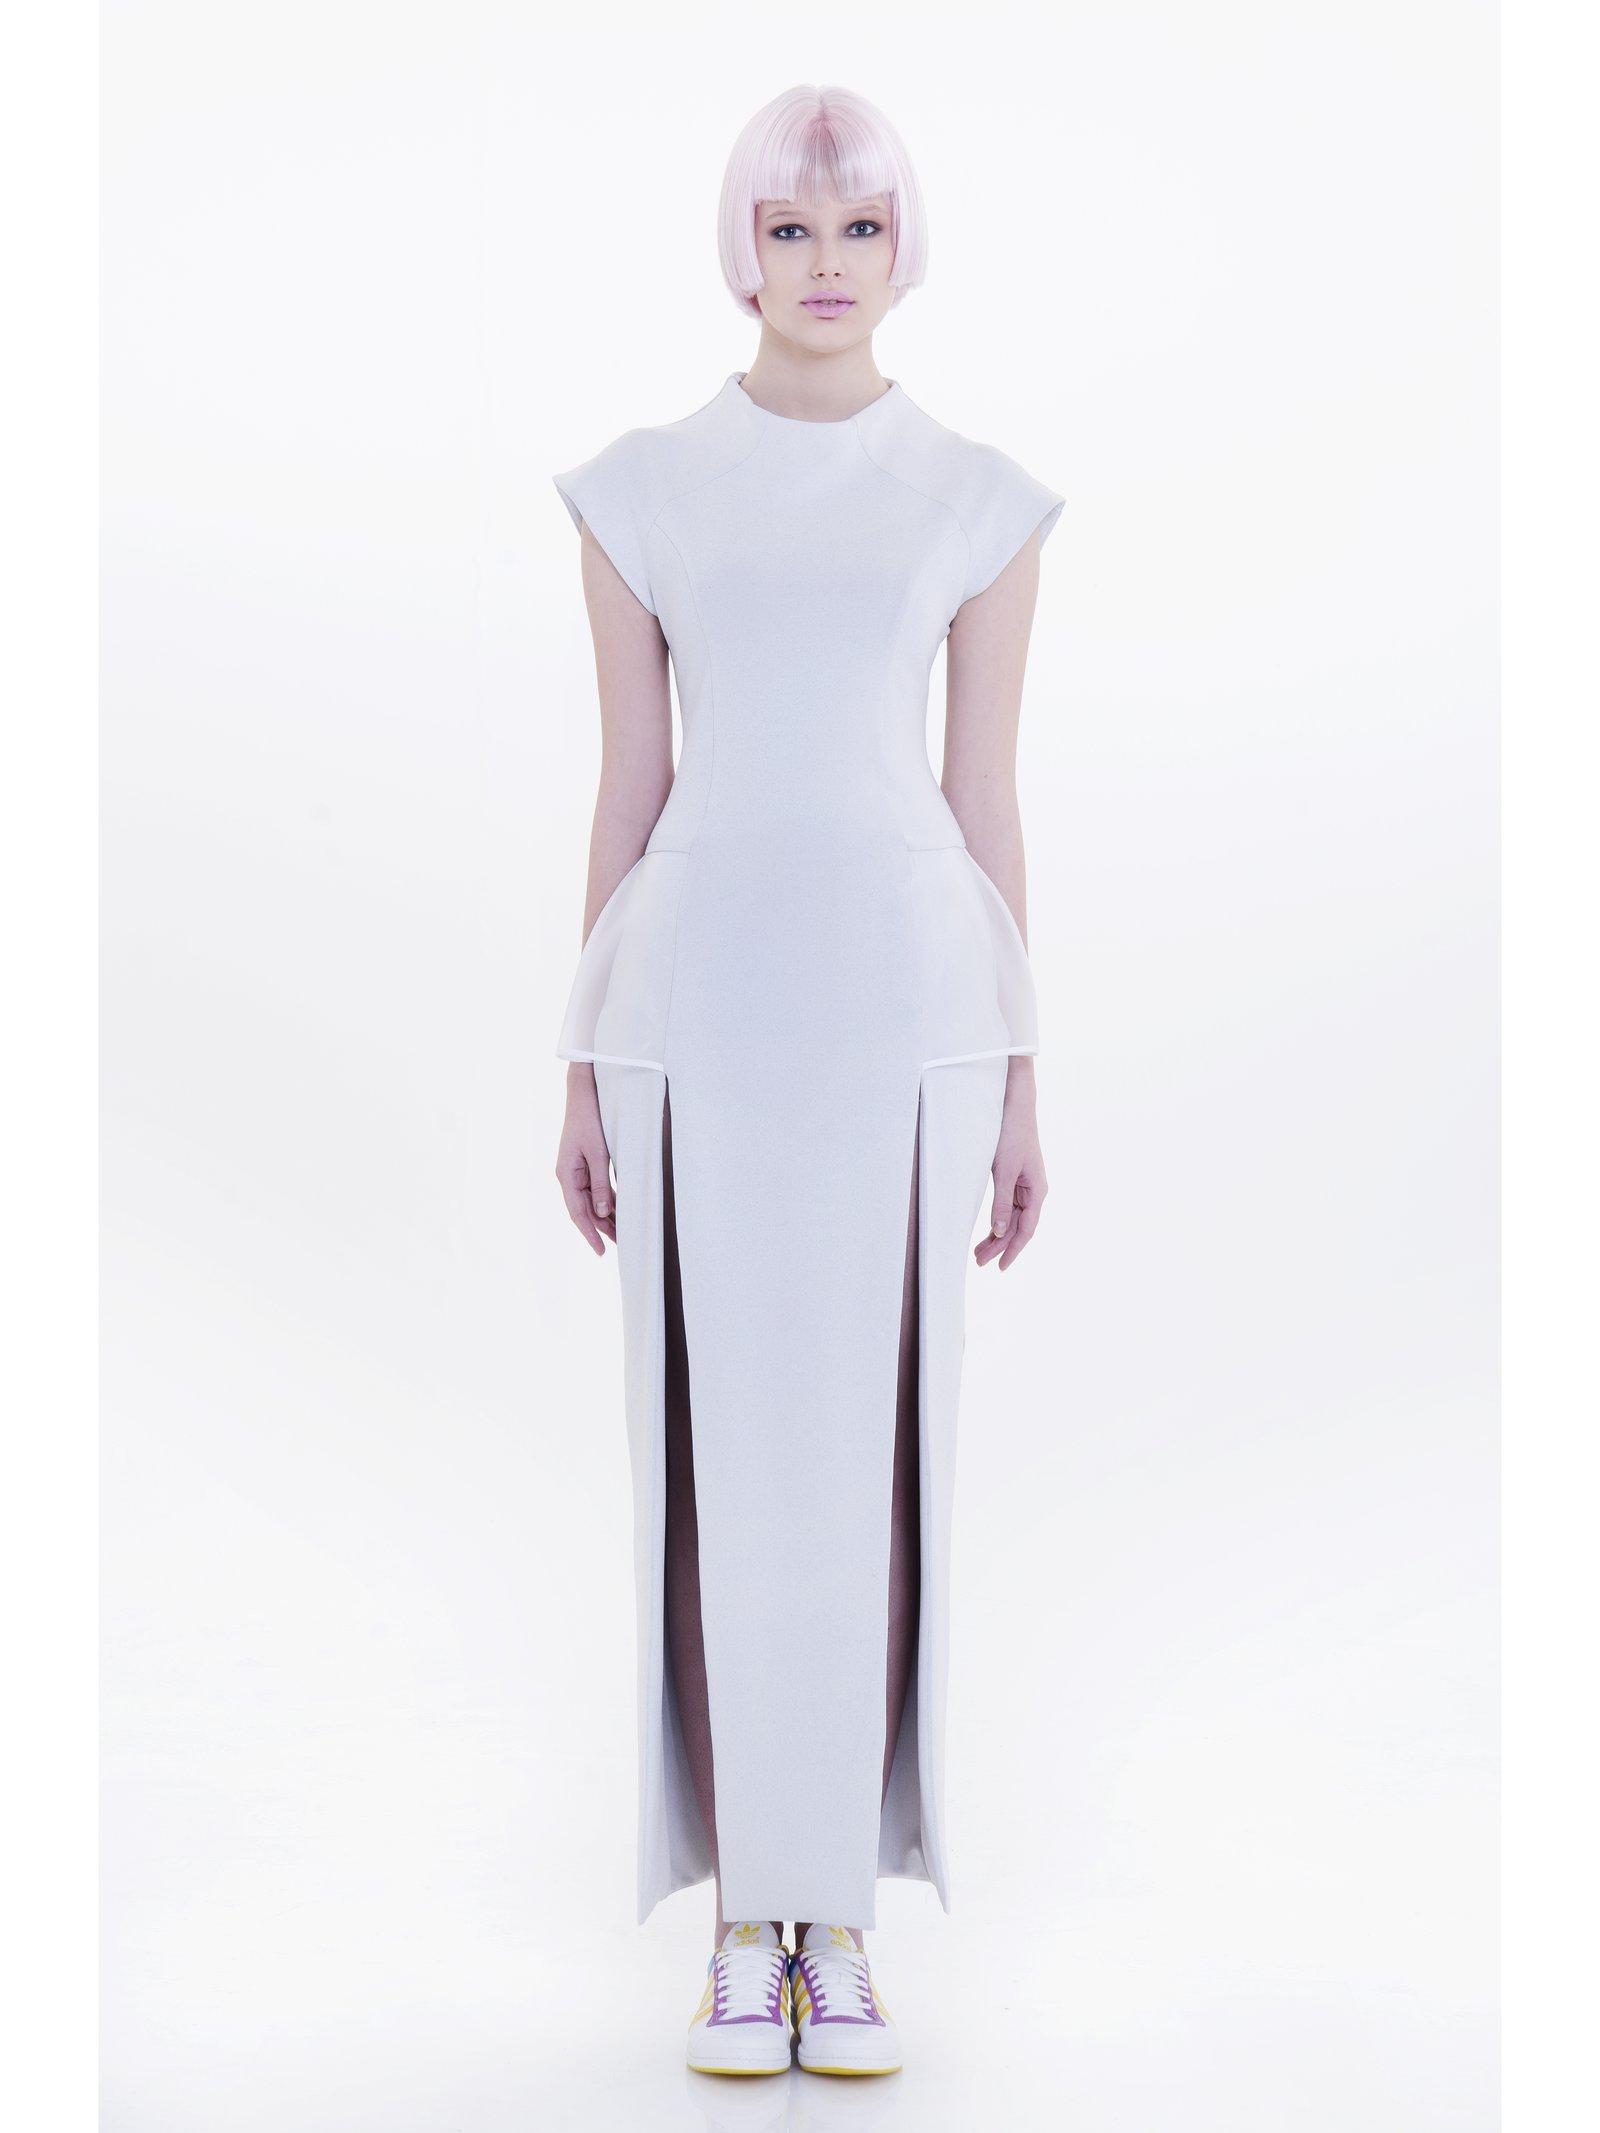 Ece Ozalp No:1 – Sport Chic Grey Dress